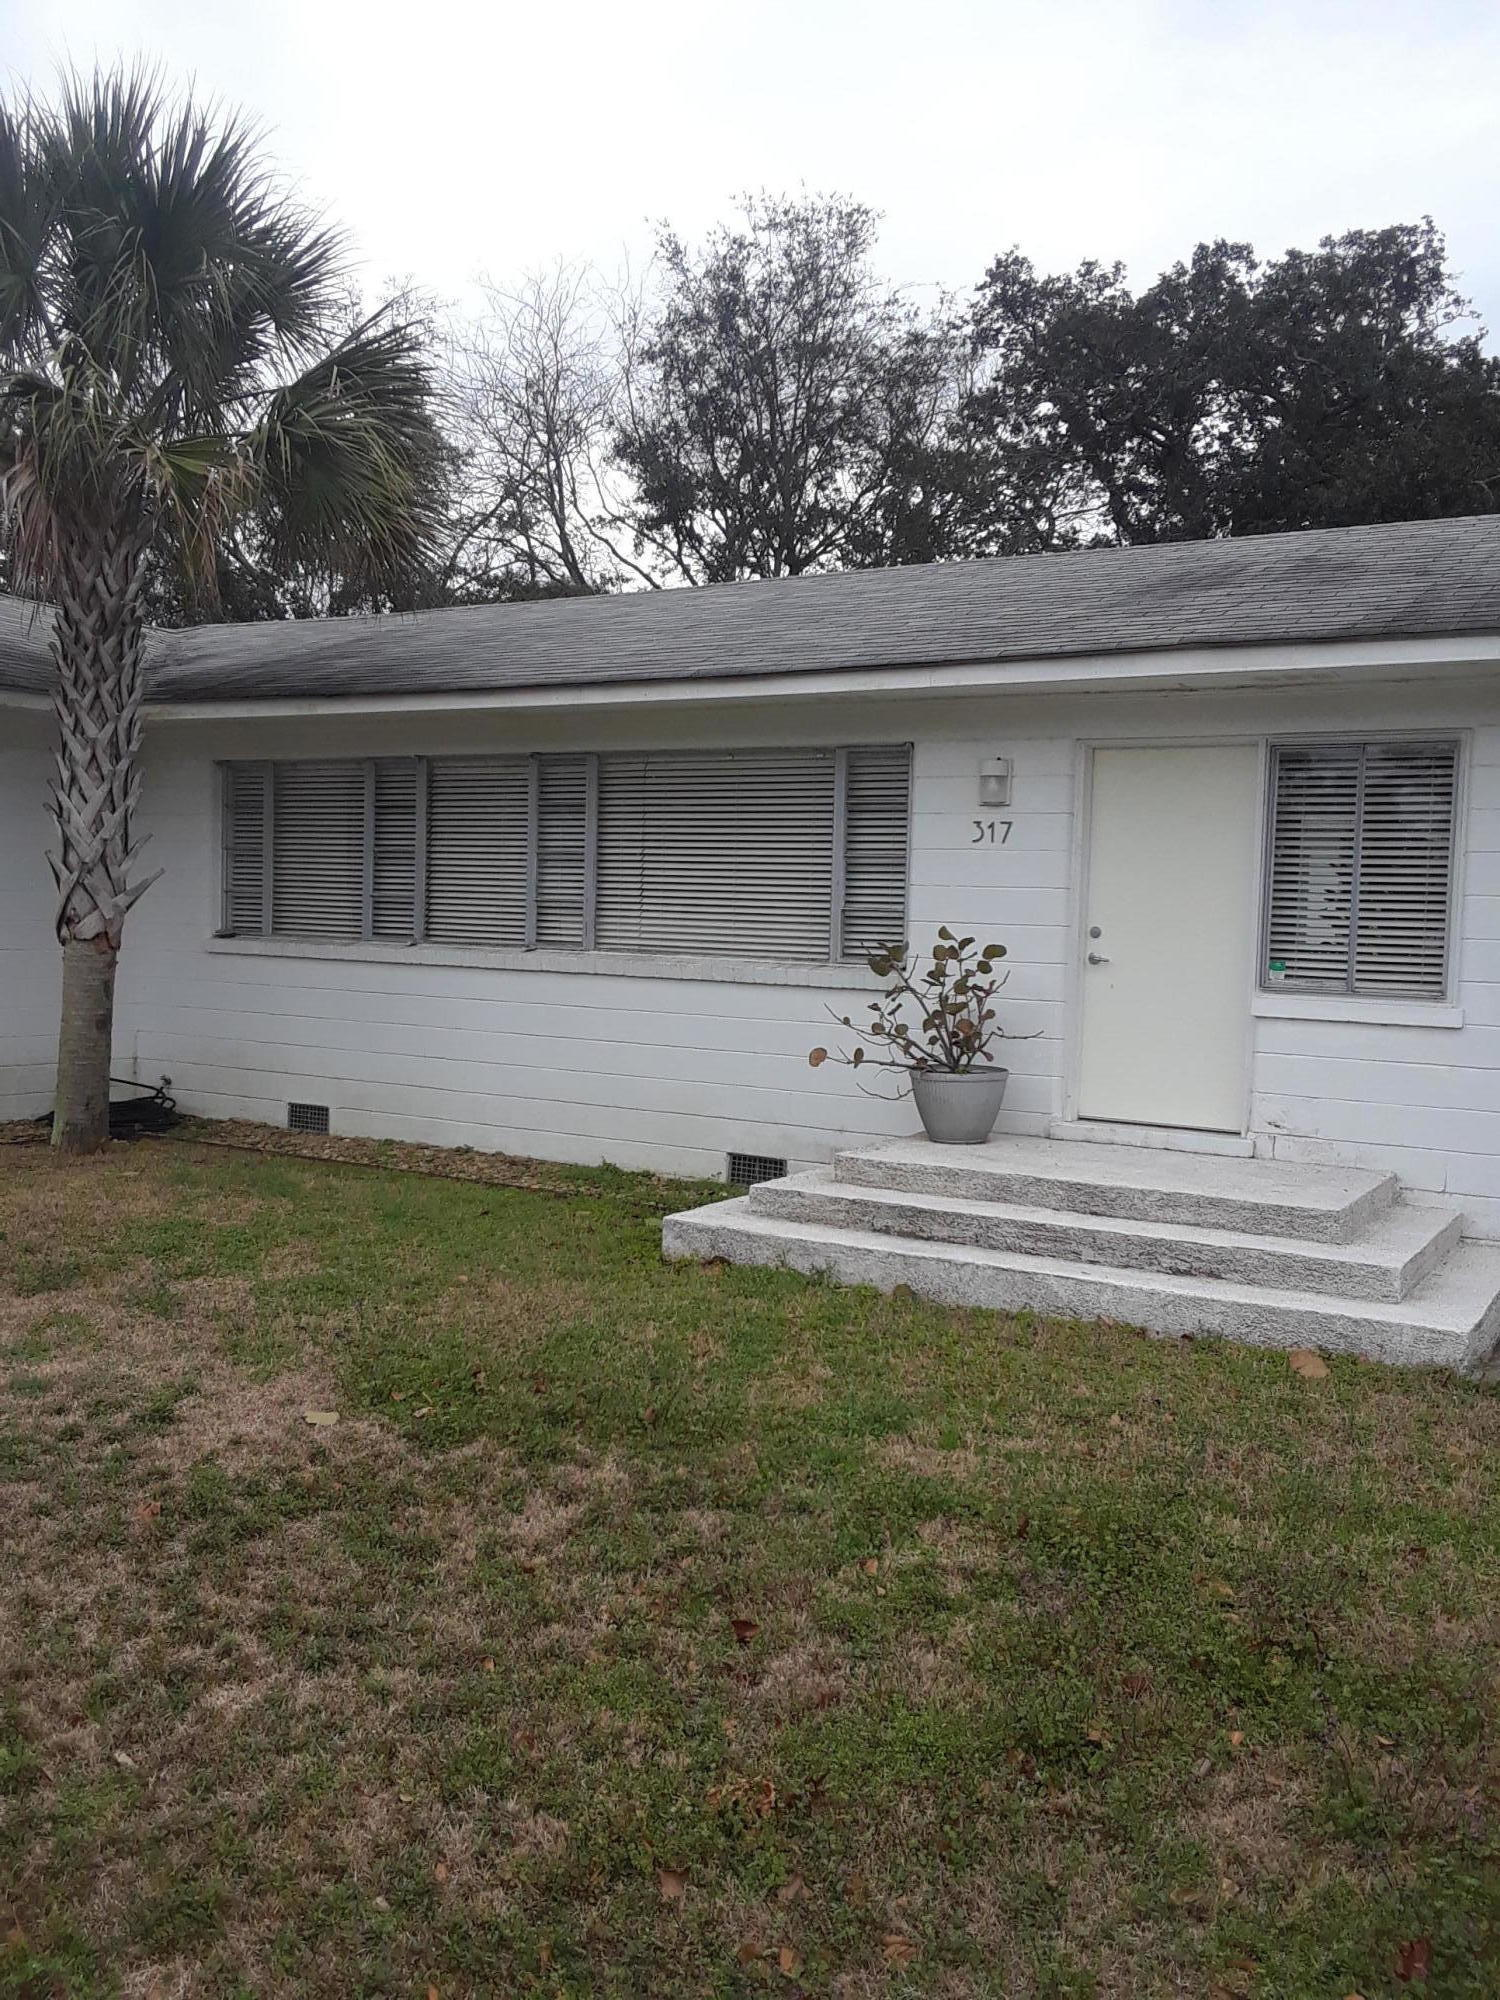 Bay View Acres Homes For Sale - 317 Palm, Mount Pleasant, SC - 0